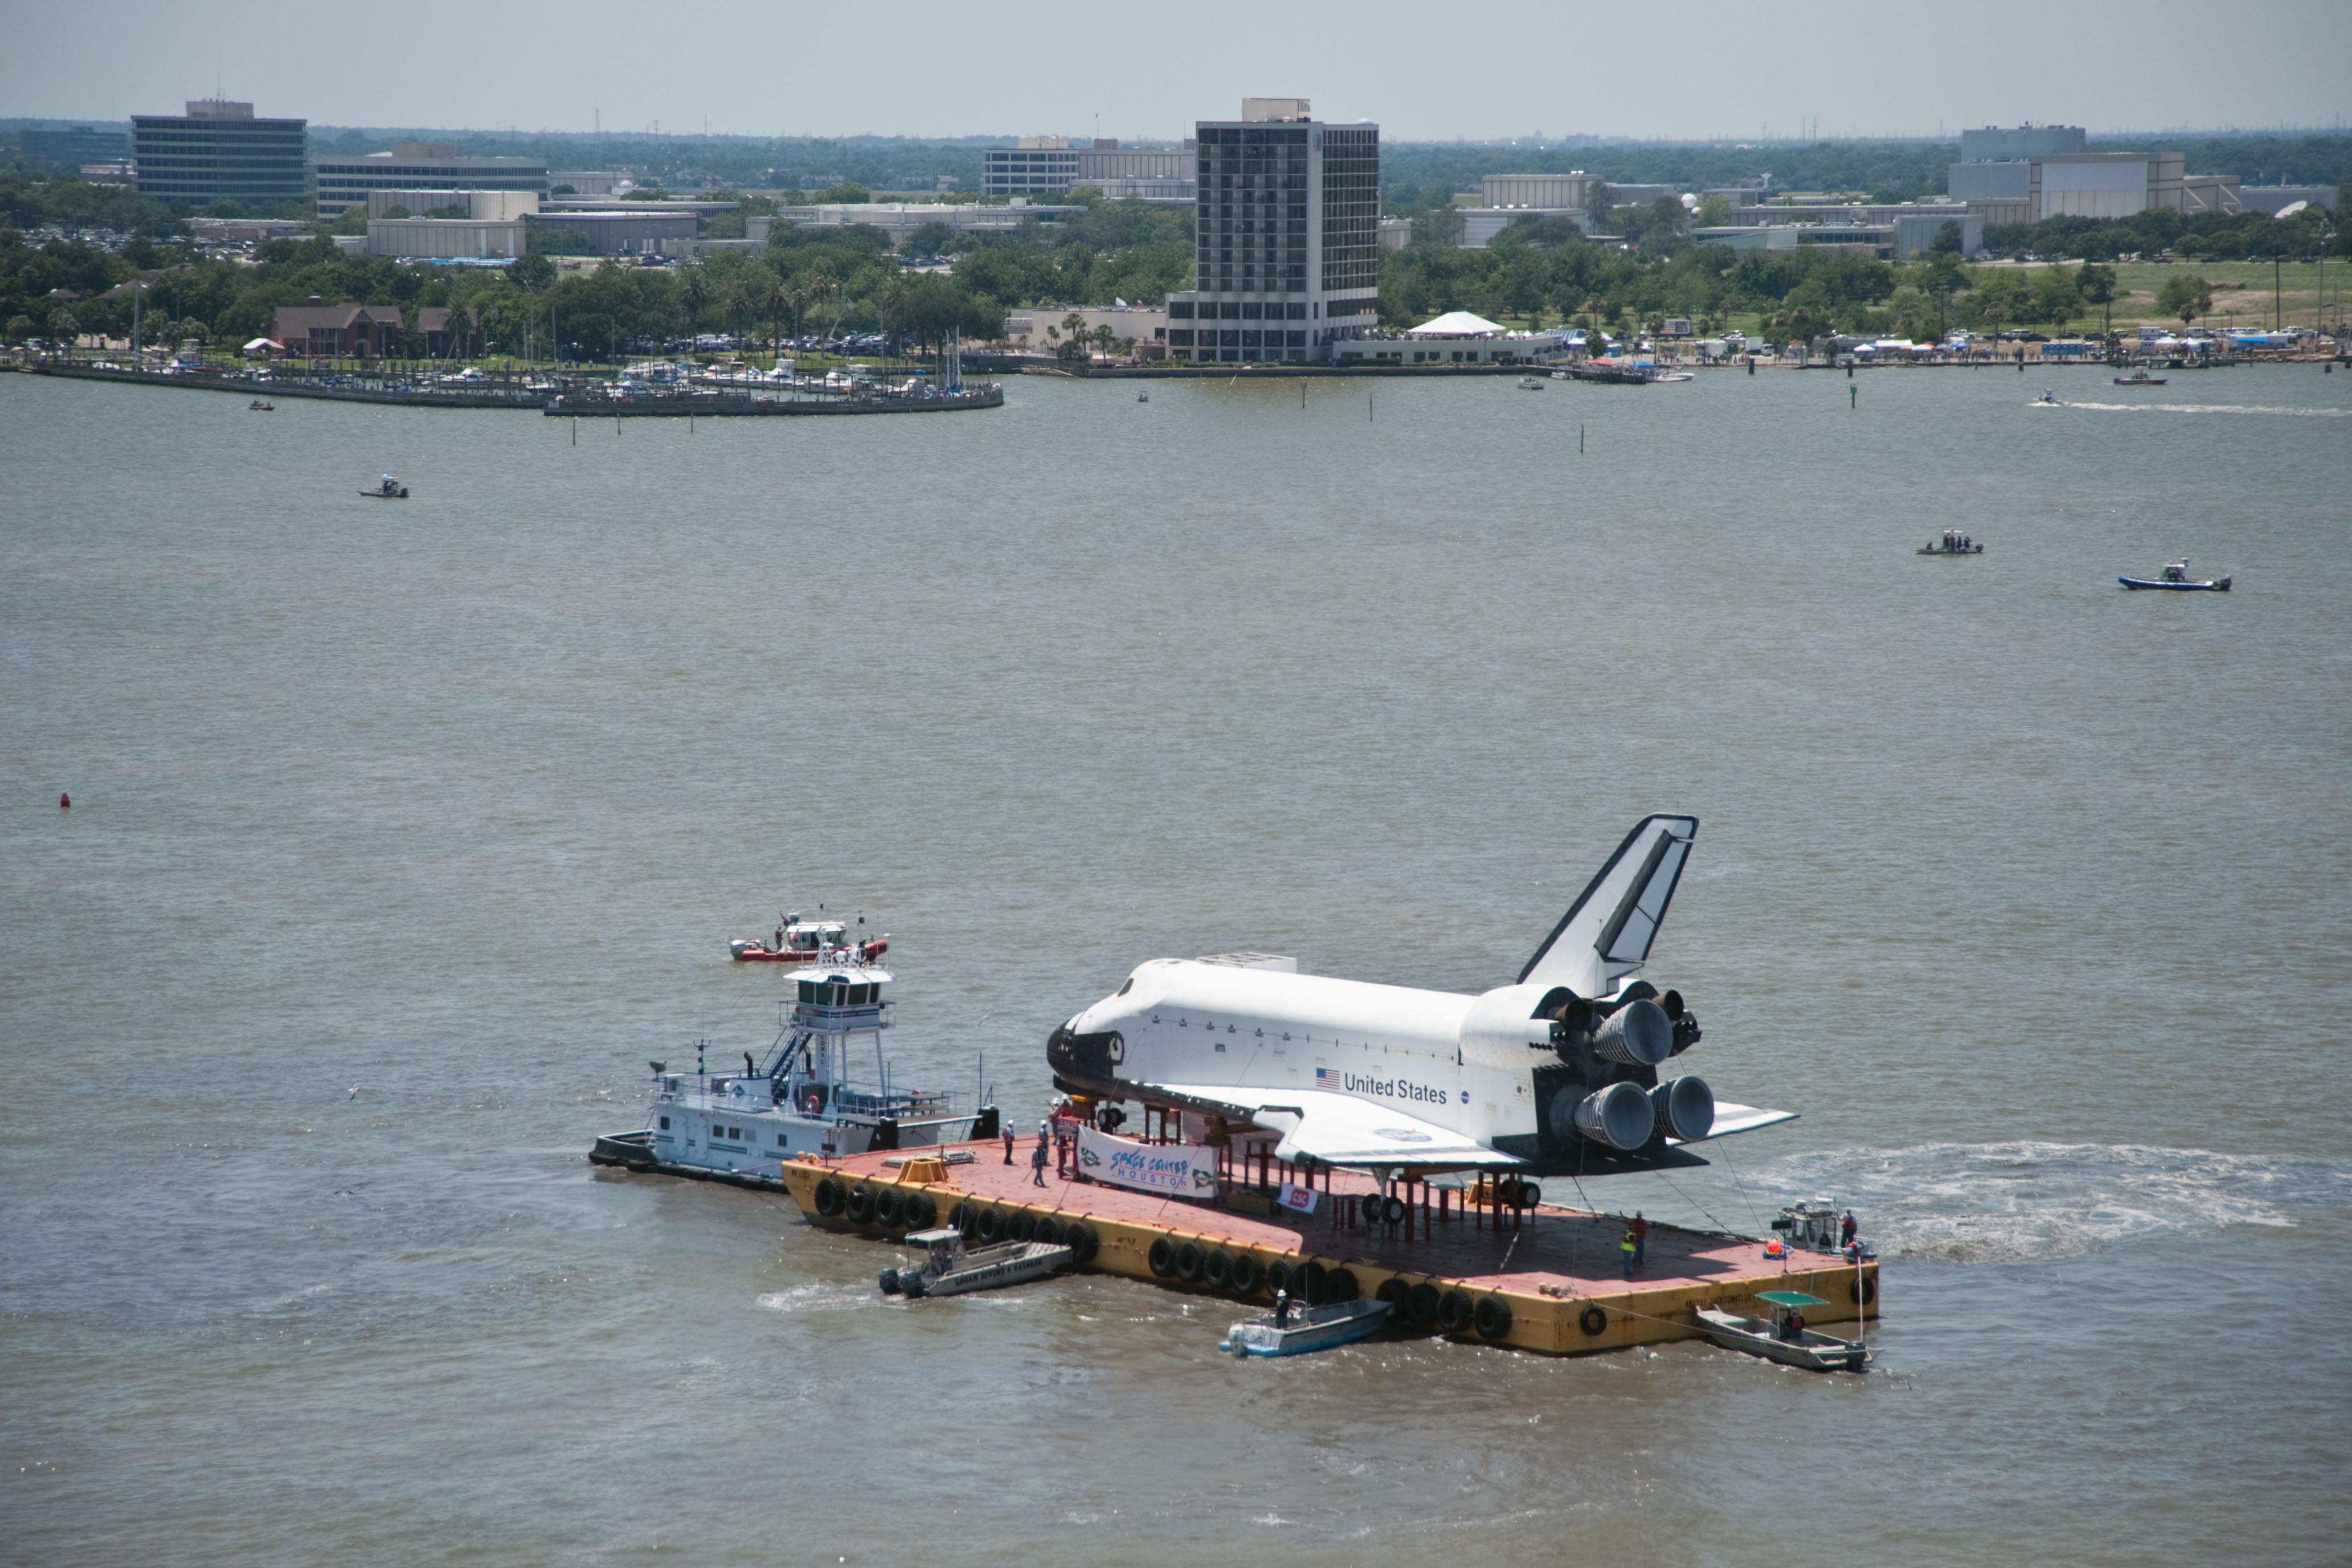 space shuttle landing in houston - photo #46